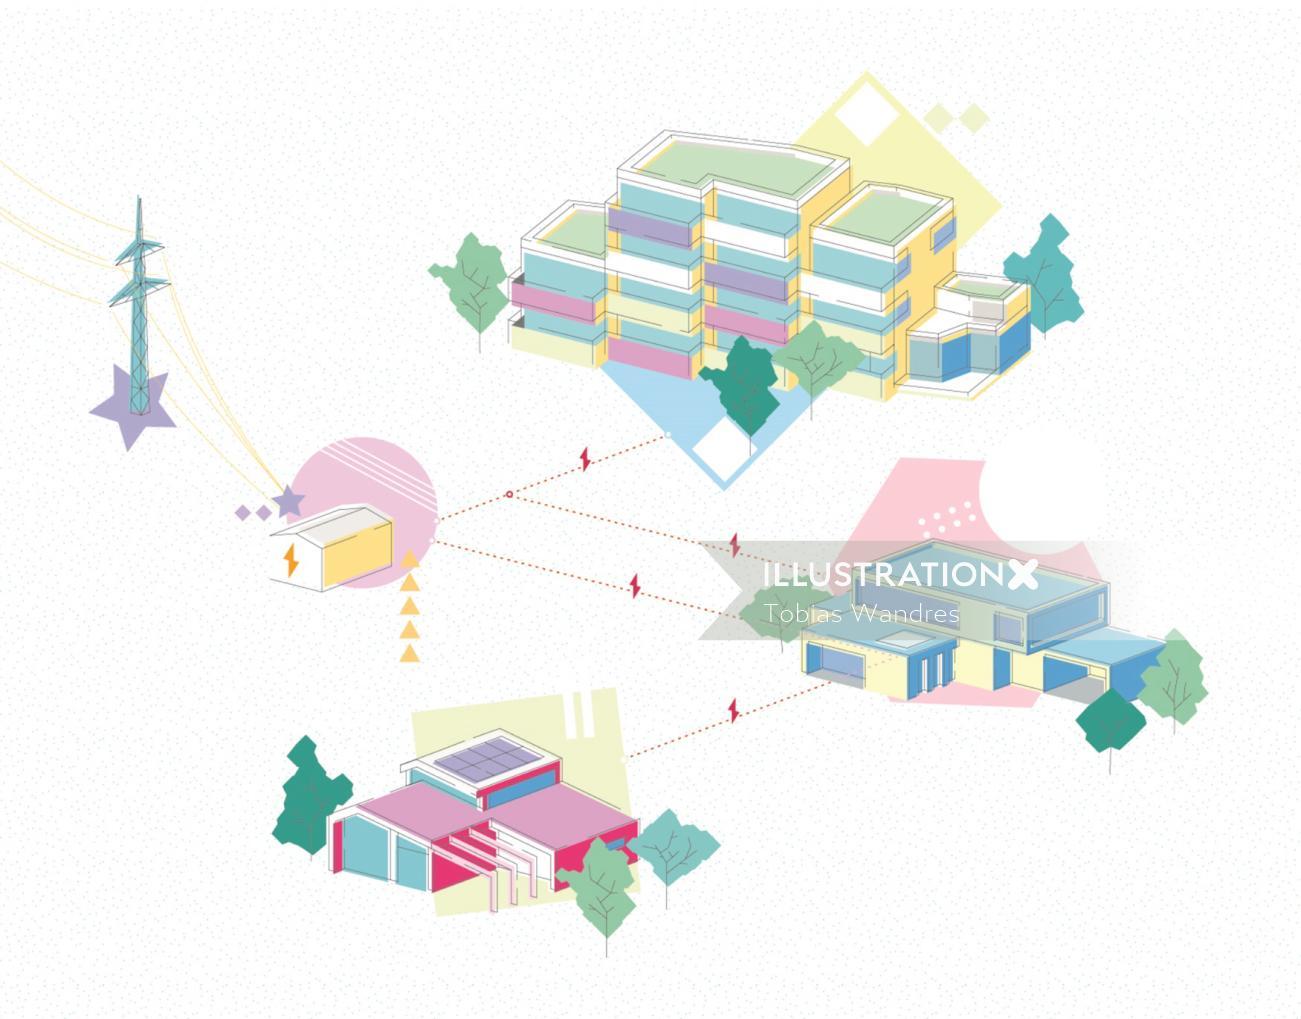 Infographic illustration of power station